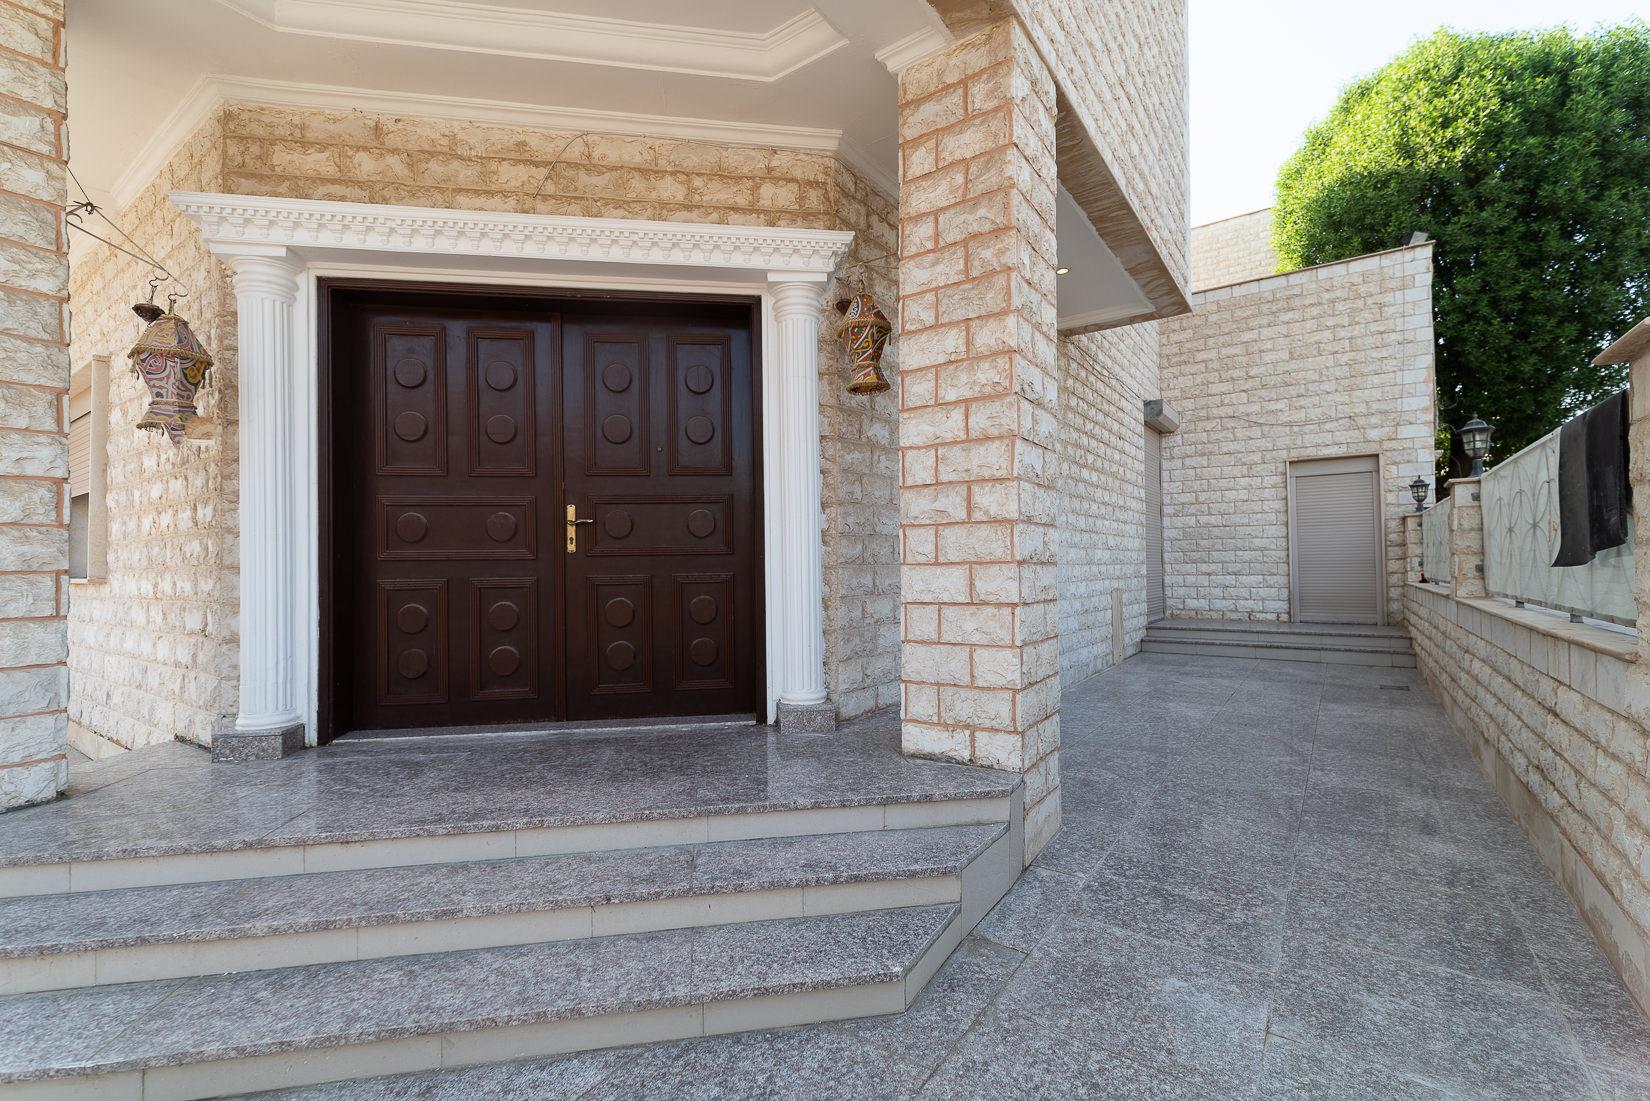 Mishref – spacious, unfurnished, five bedroom villa